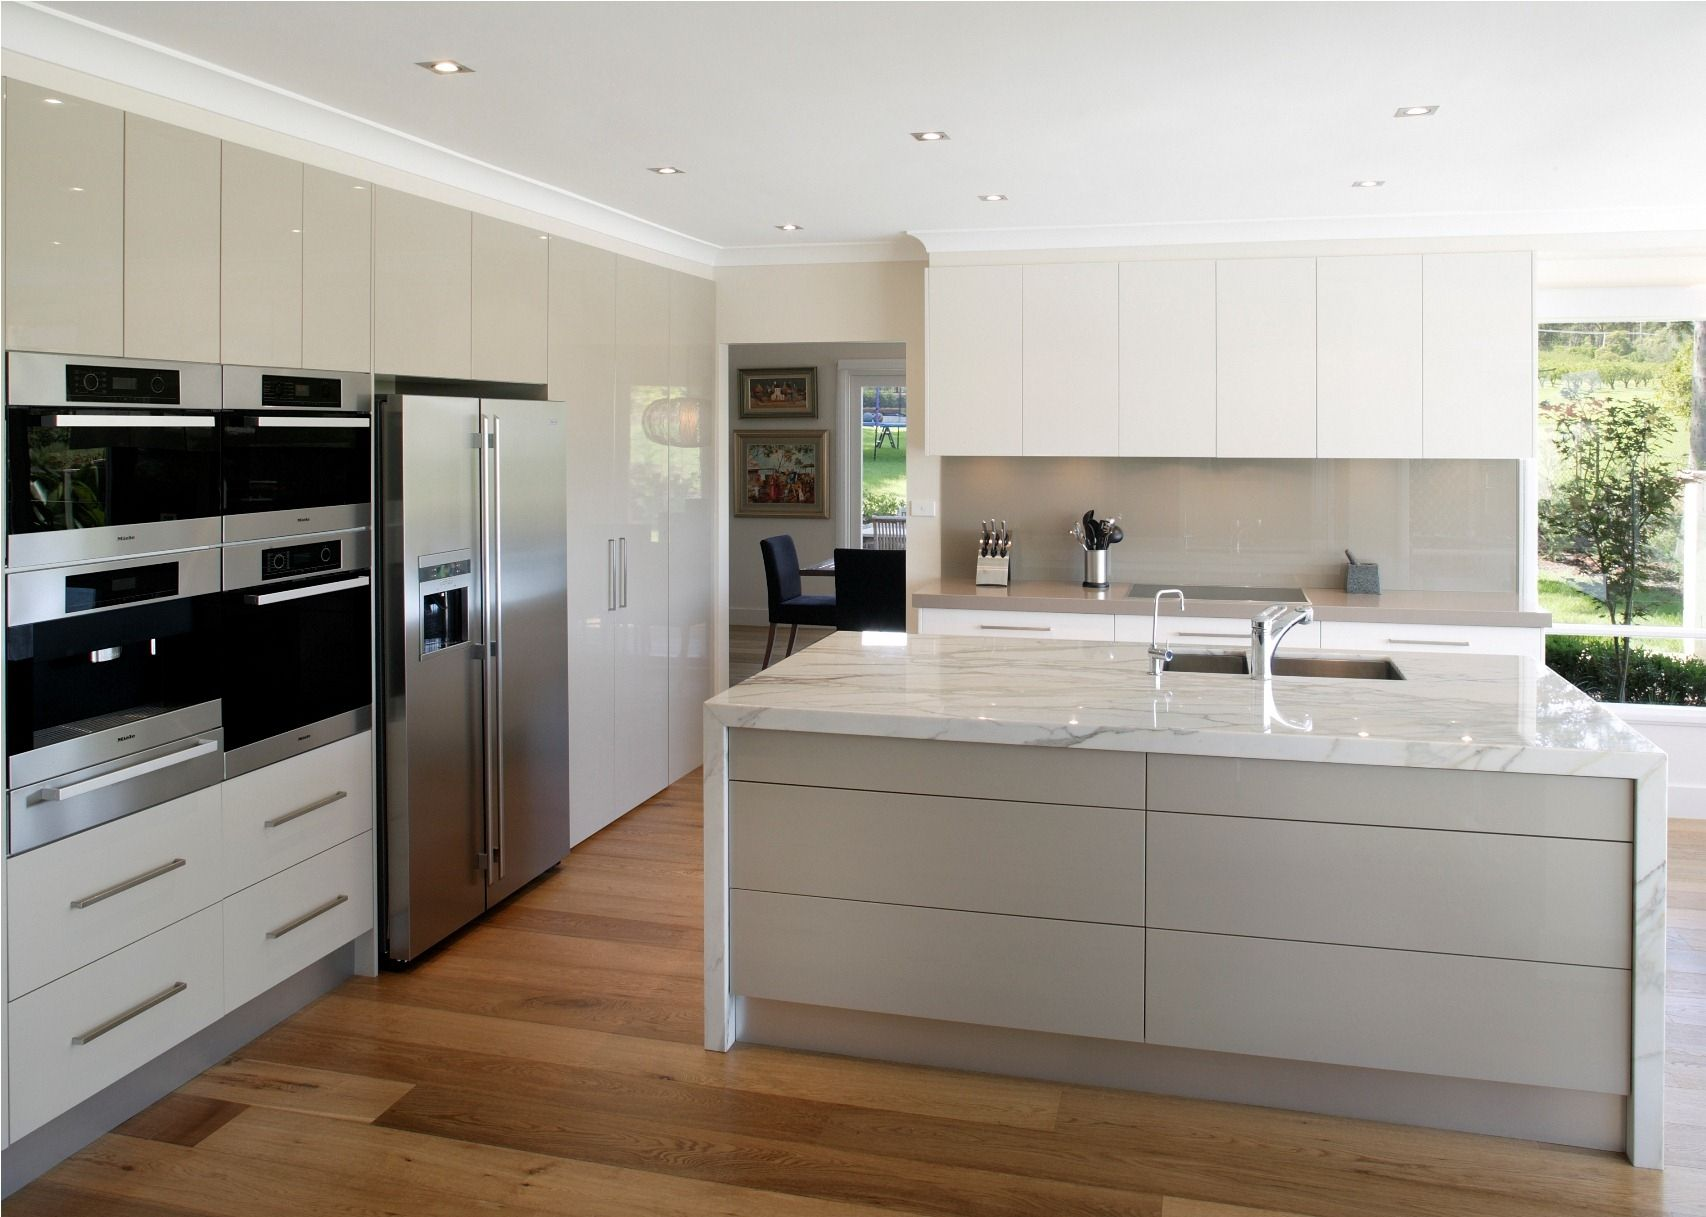 Grey Gloss Kitchen Flooring Kitchen u nizwa